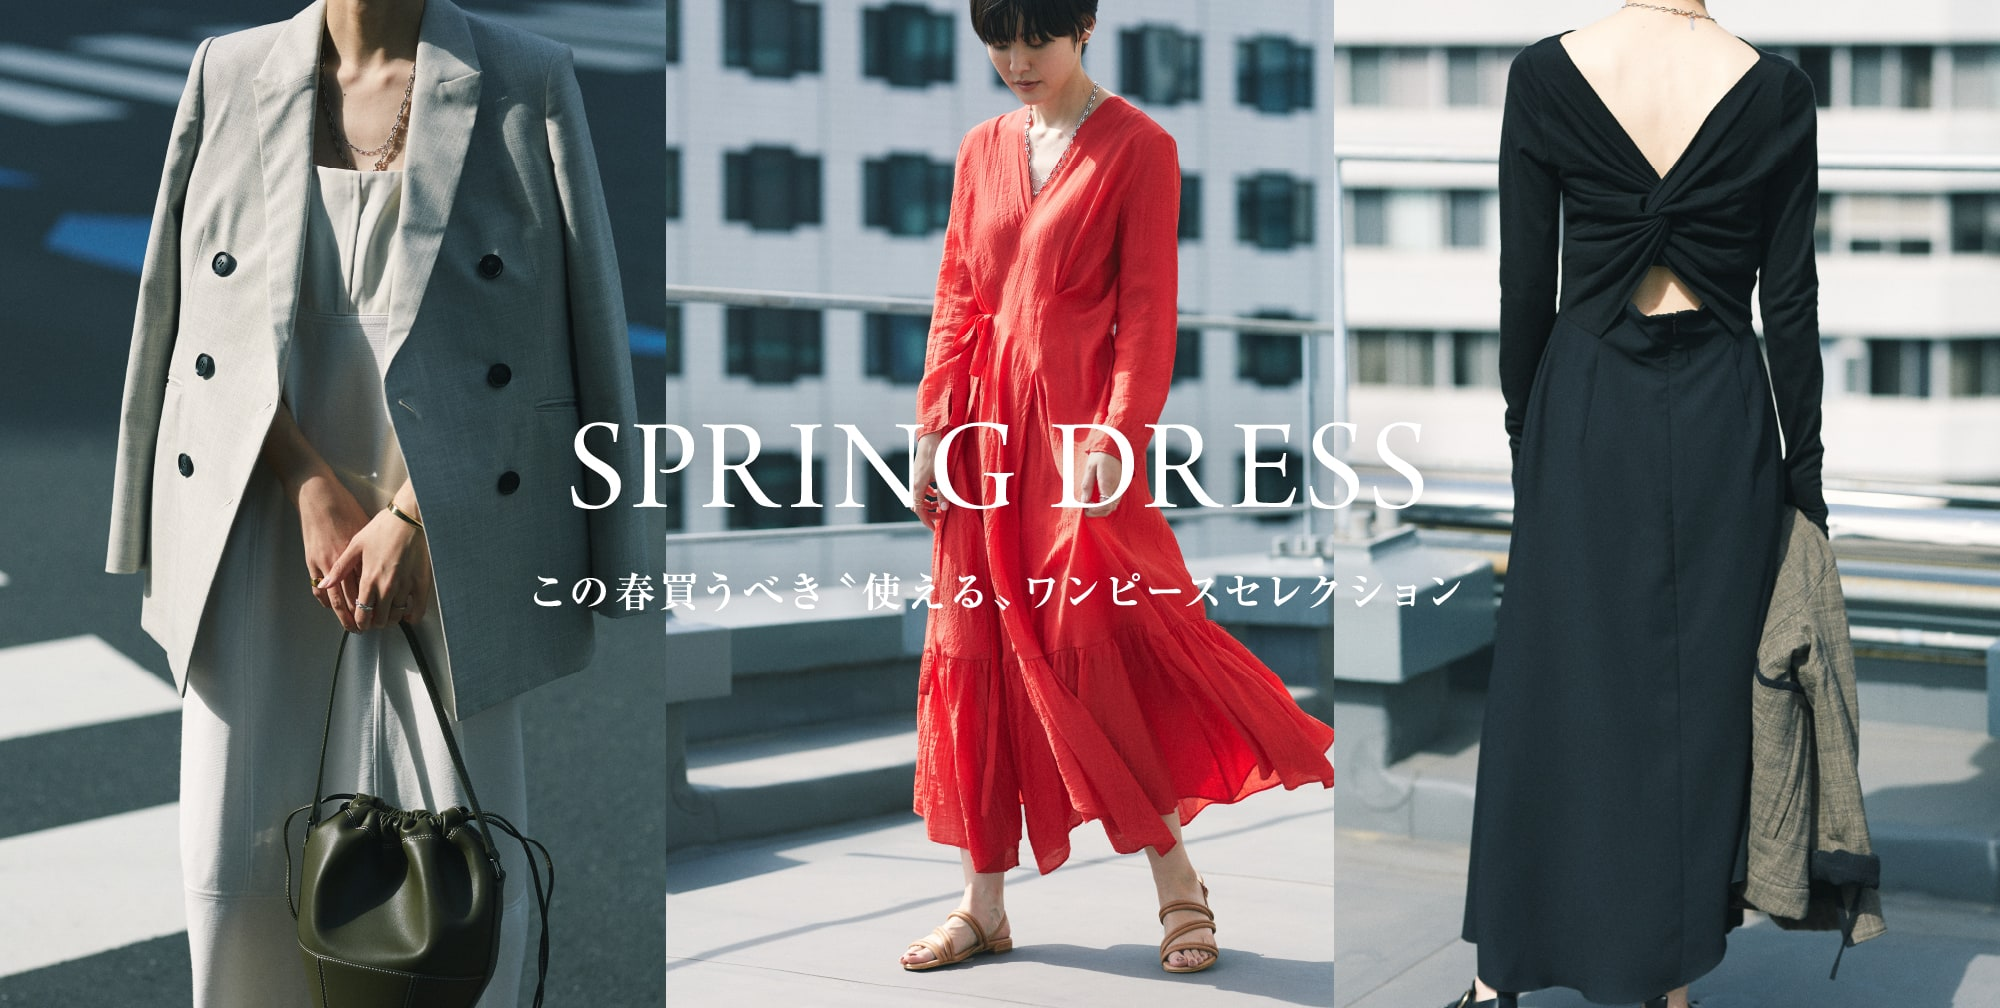 Spring Dress: この春買うべき〝使える〟ワンピースセレクション